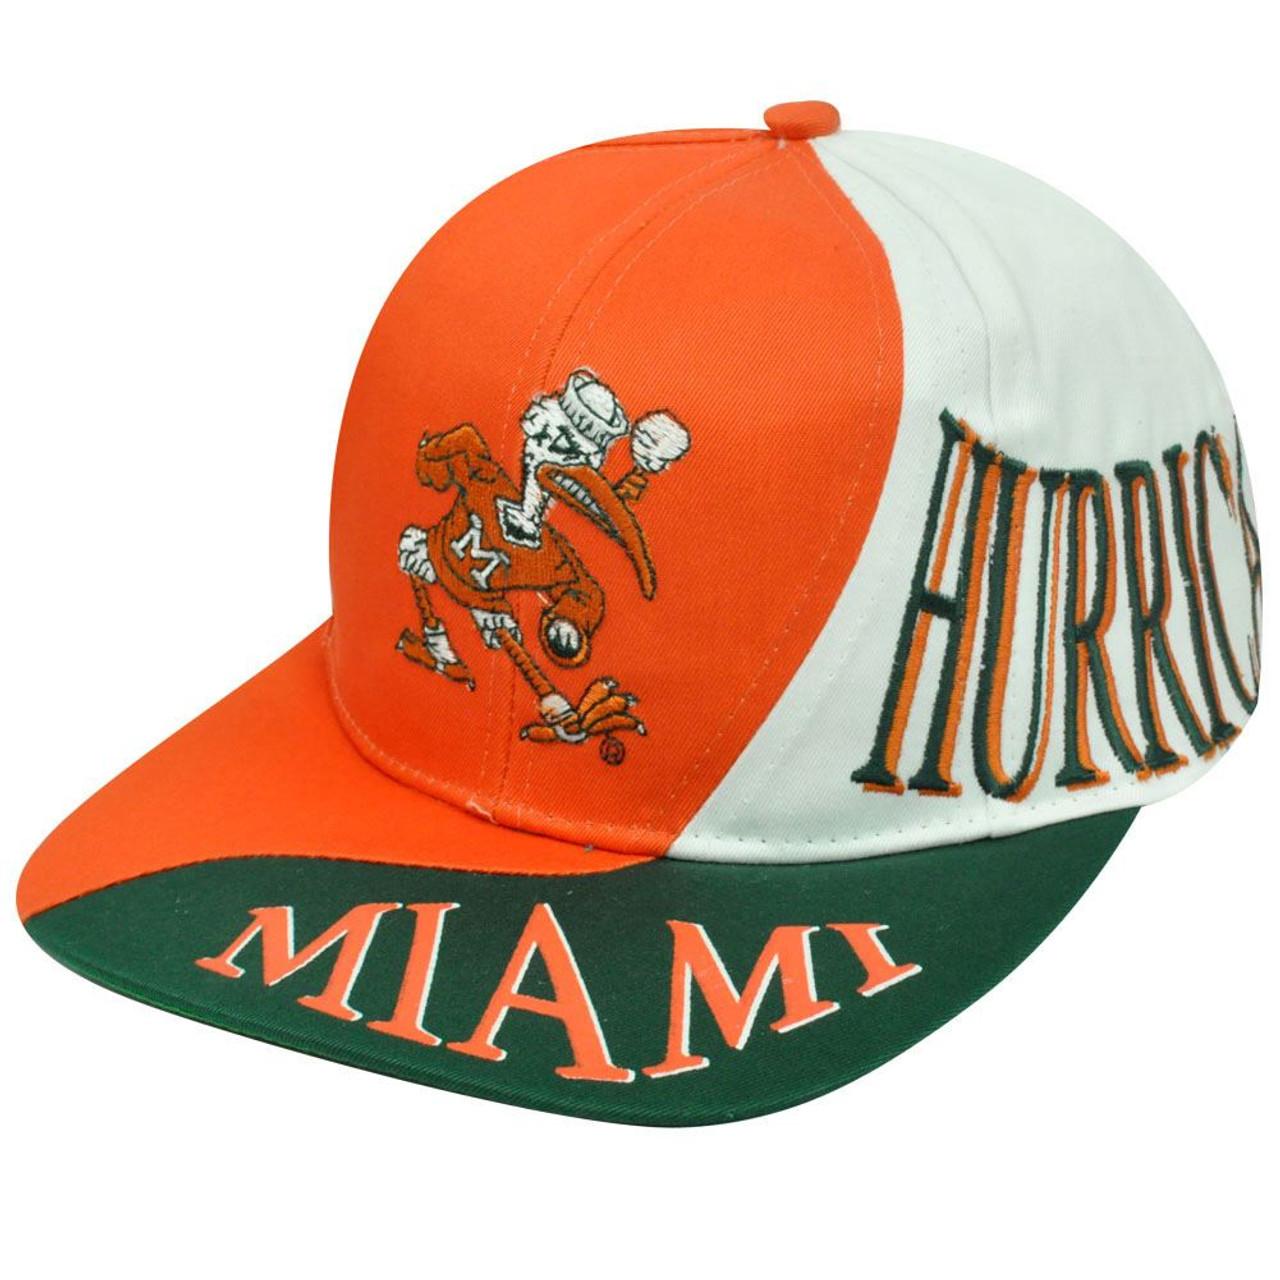 8fb3b85f9070 NCAA Miami Hurricanes Vintage Old School Snapback Wave Hat Cap Orange Green